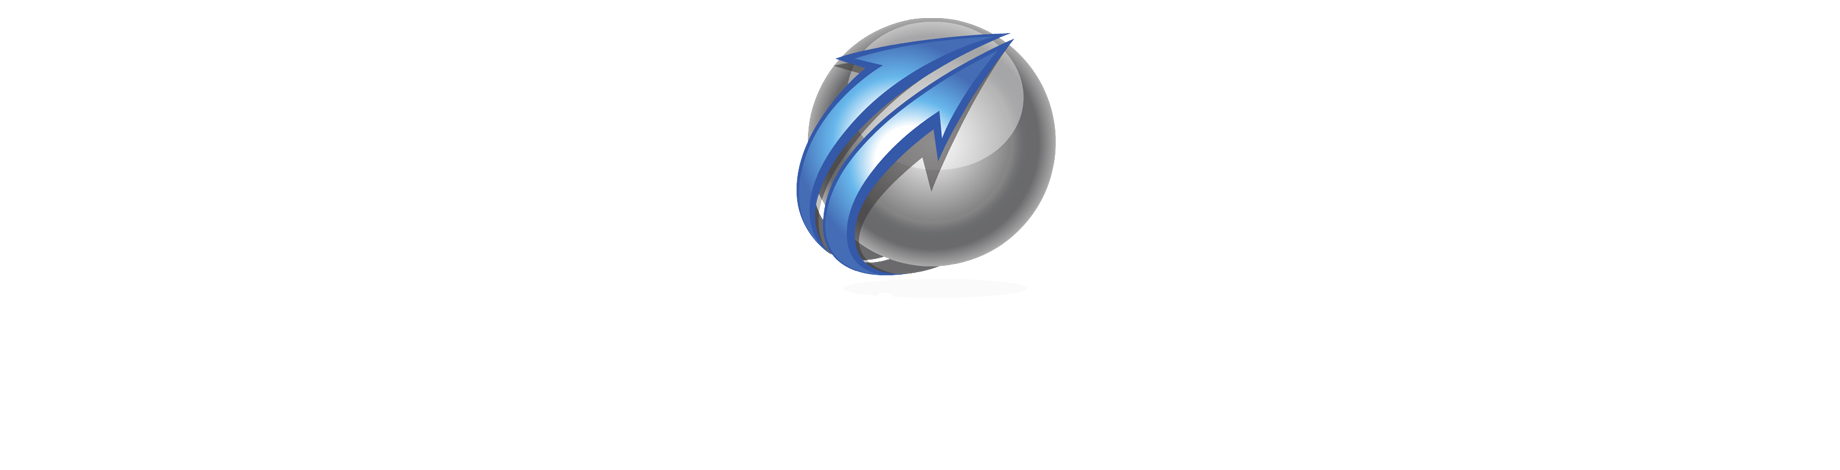 cynertia electric and control inc Logo